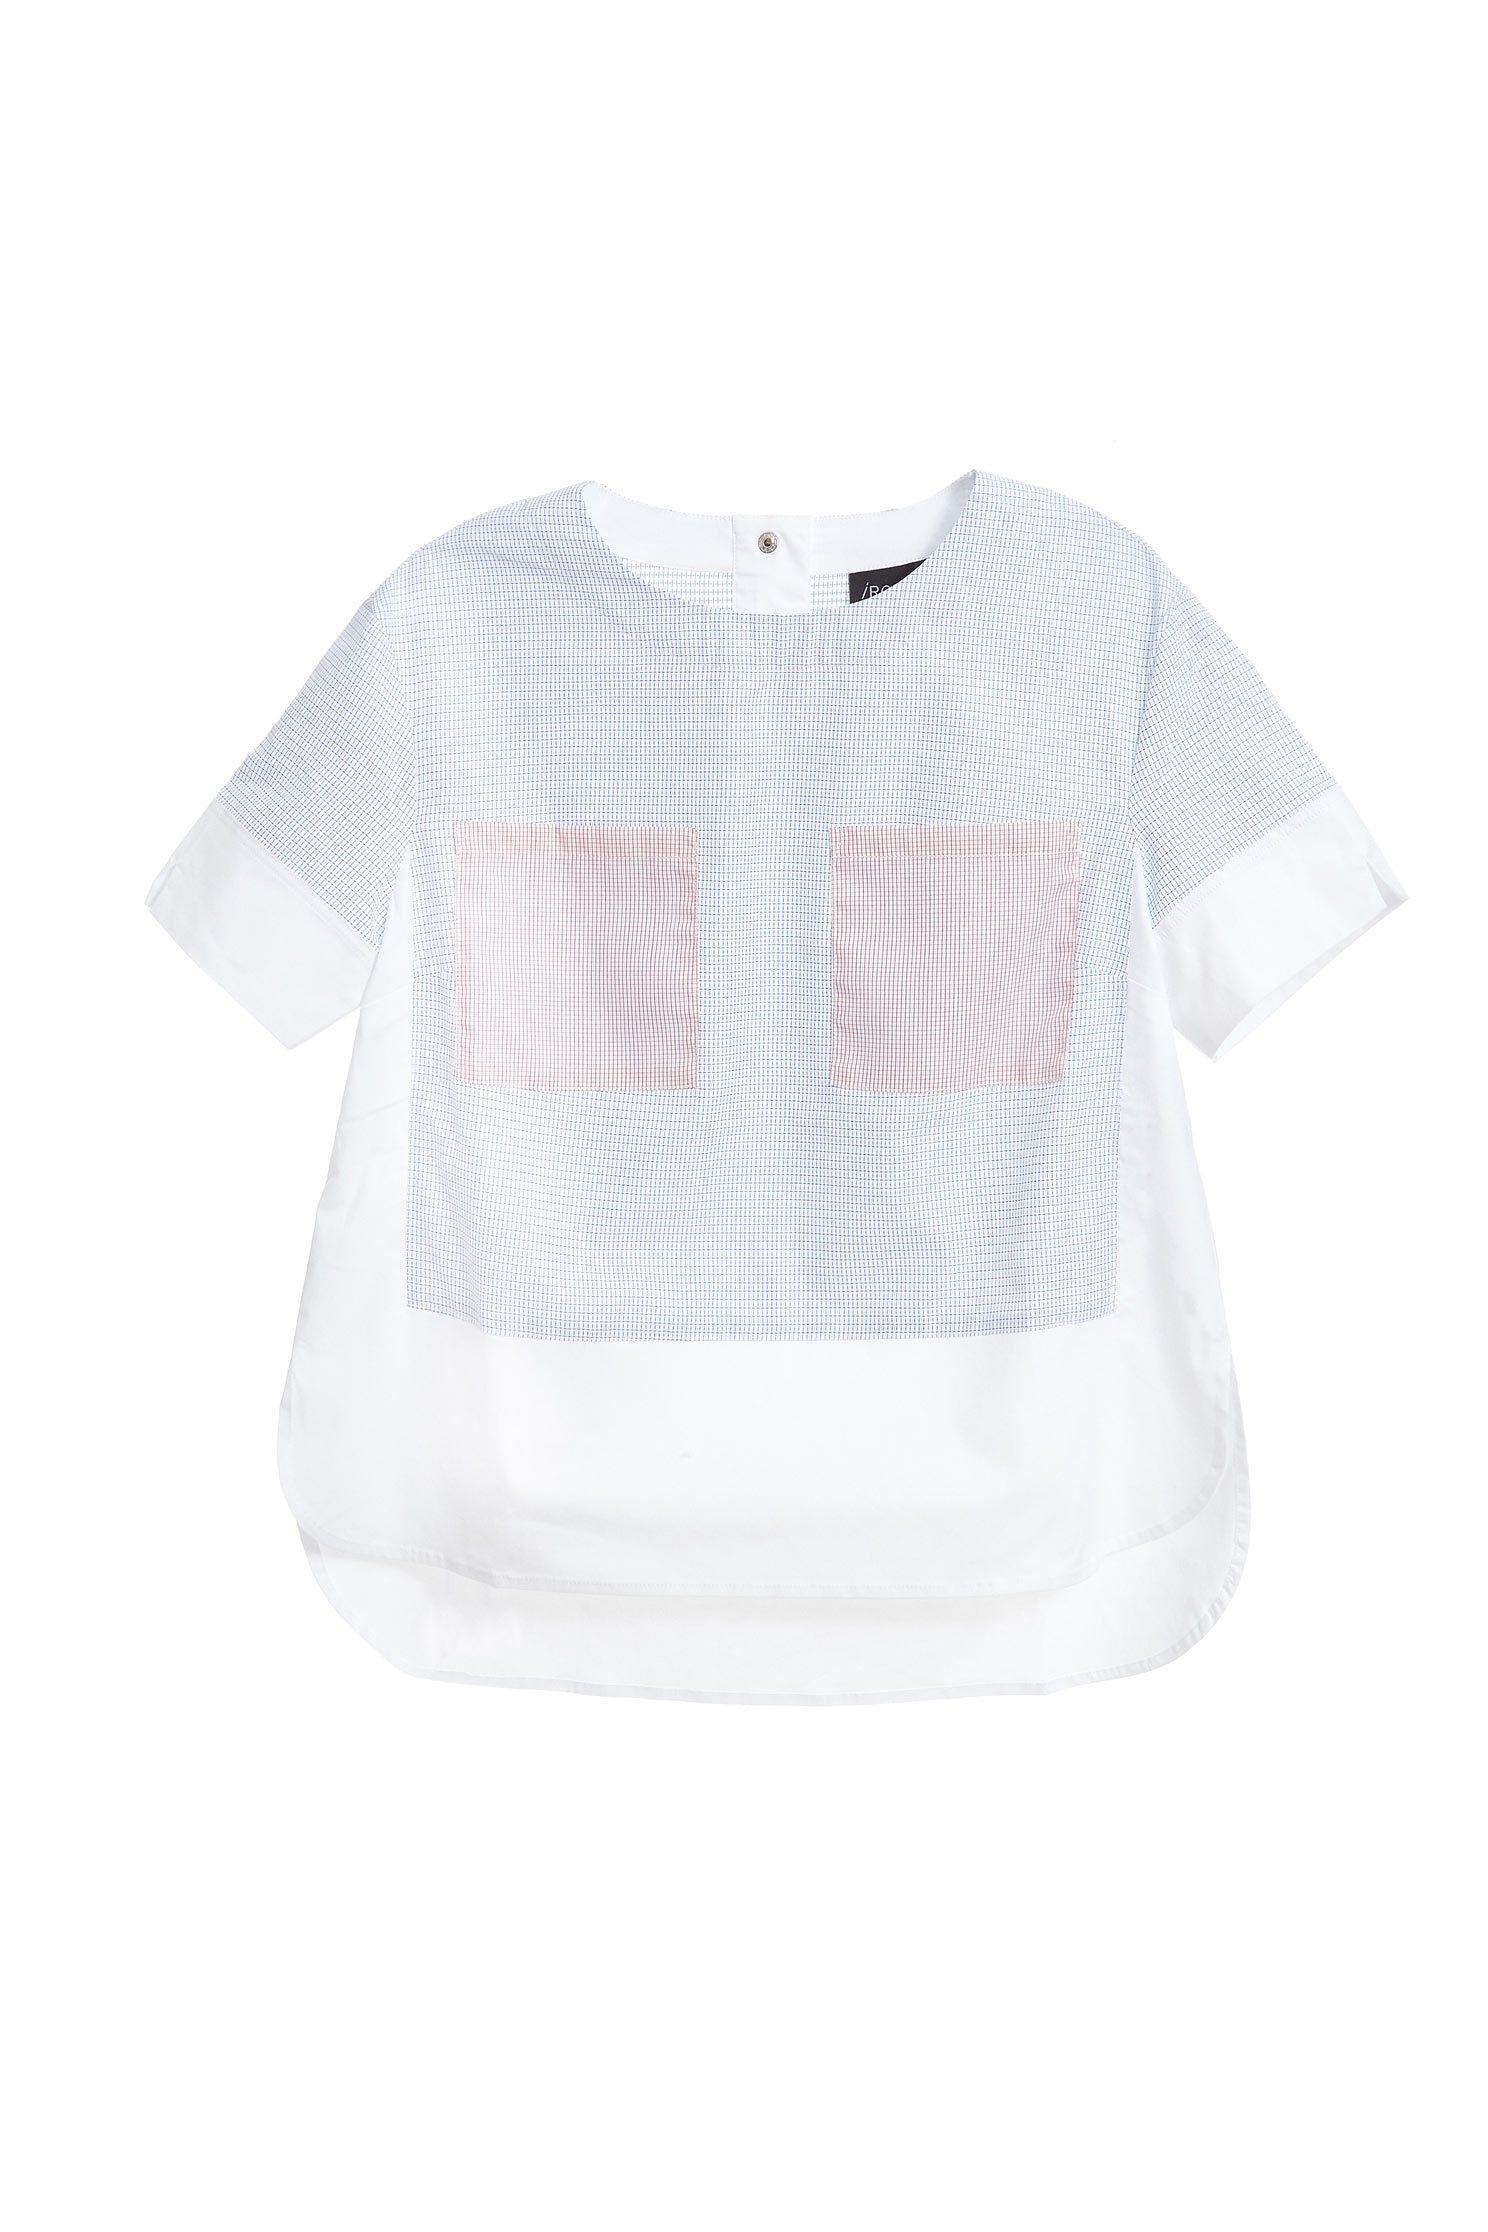 Double-pocket design top